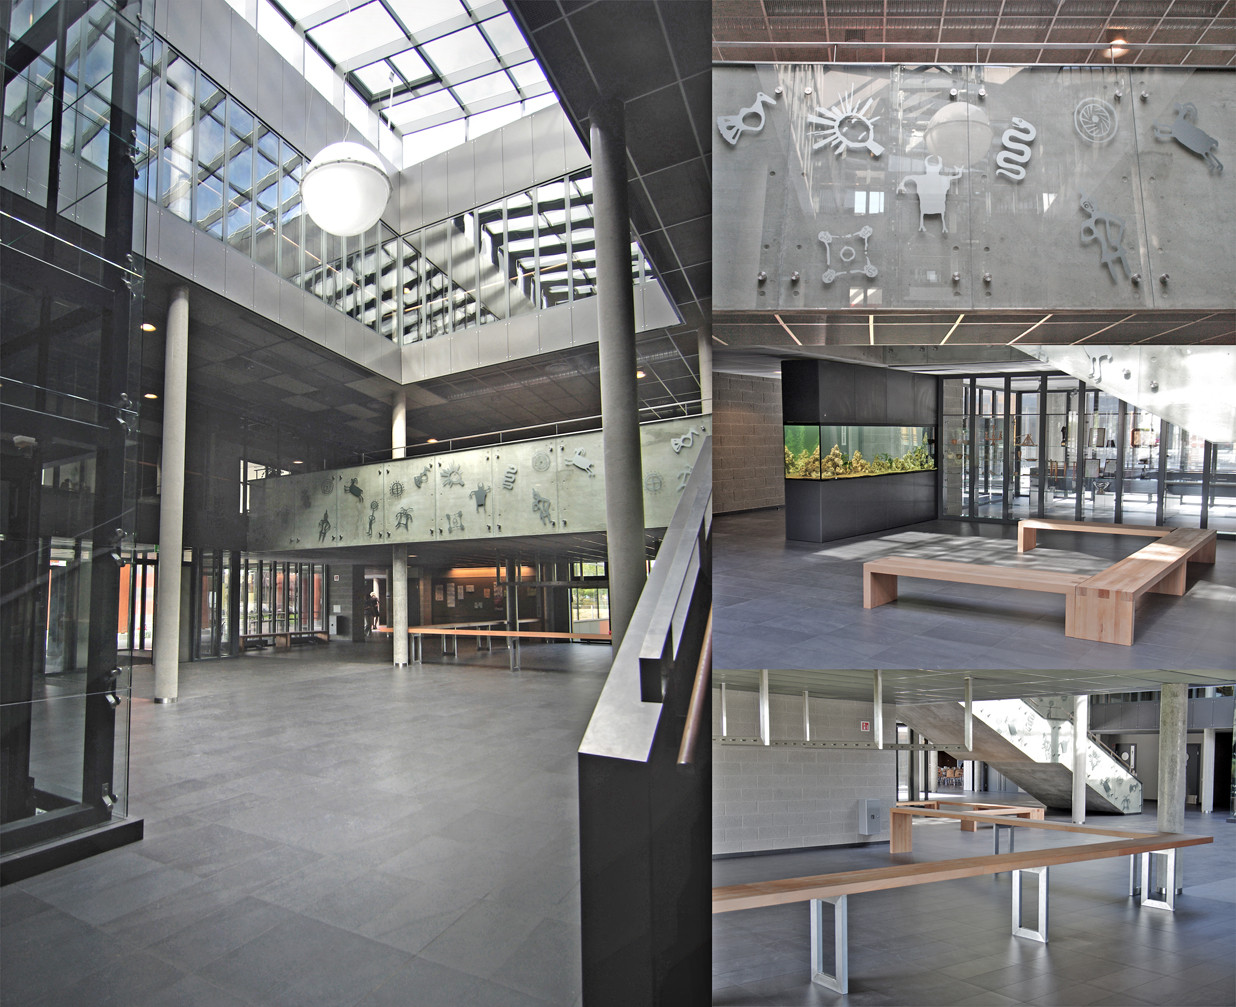 gallery of school in balsiai sigitas kuncevi ius architecture studio 7. Black Bedroom Furniture Sets. Home Design Ideas